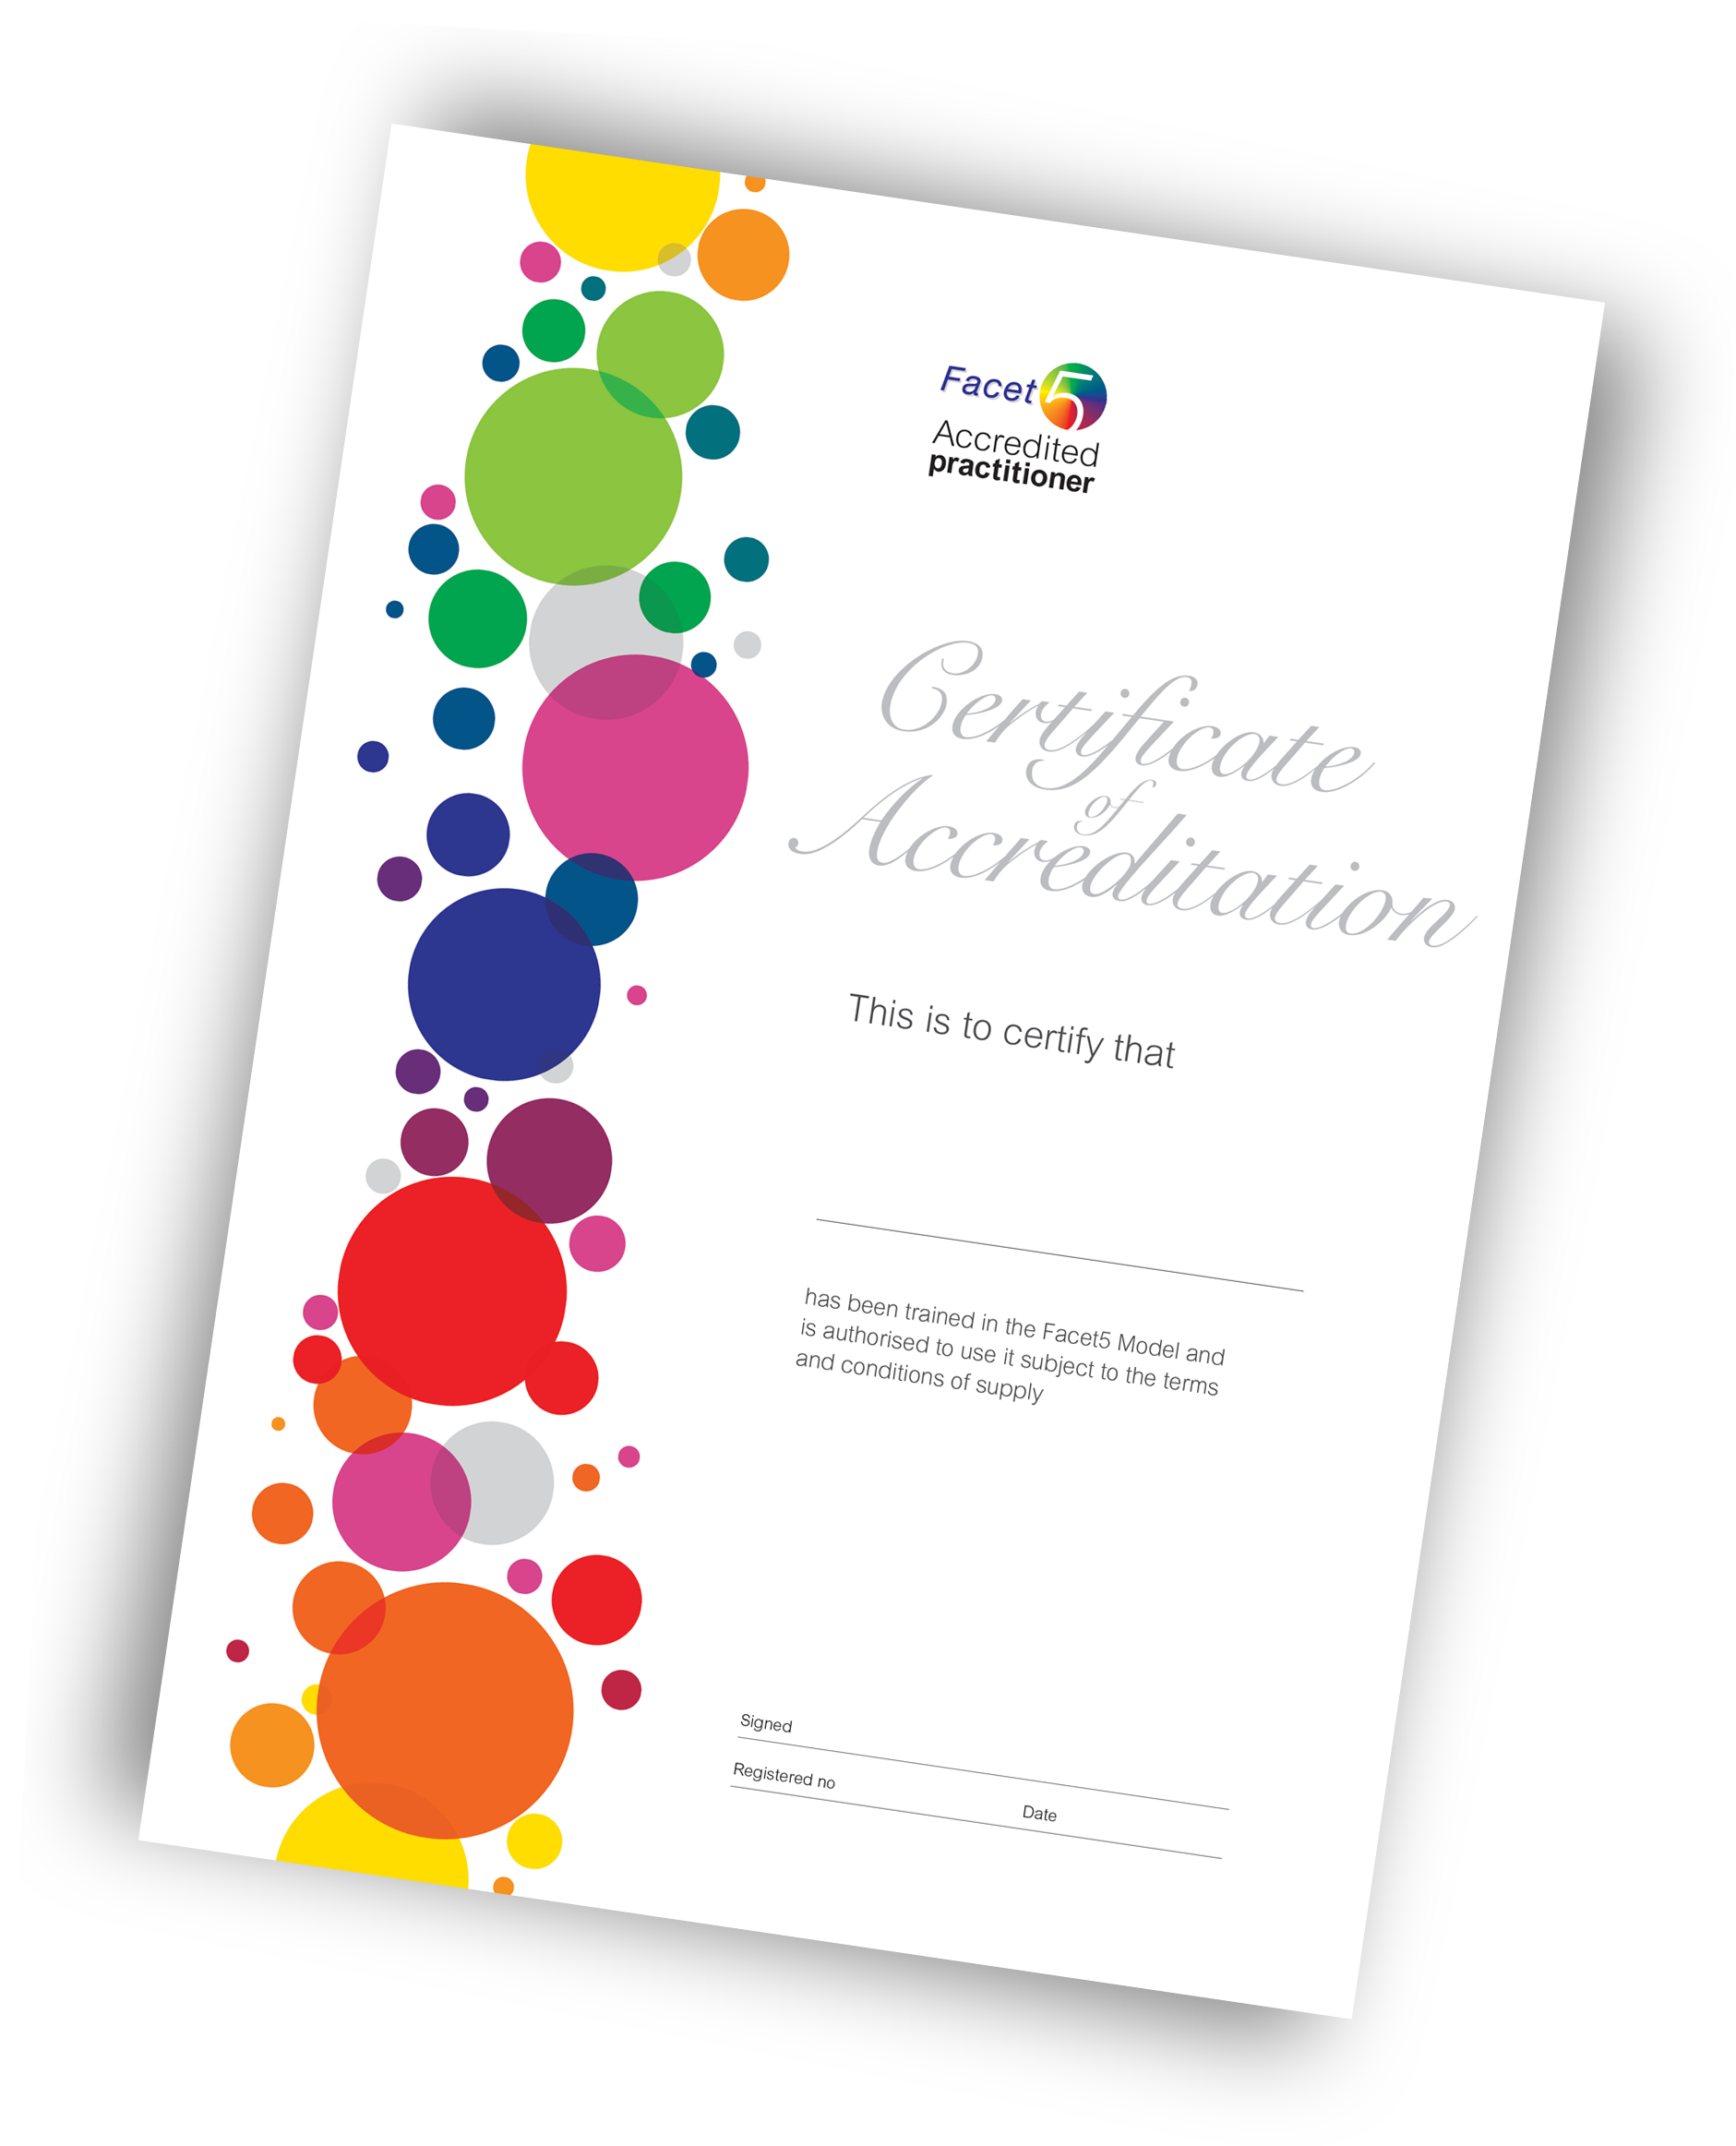 Facet5 Accreditation certificate